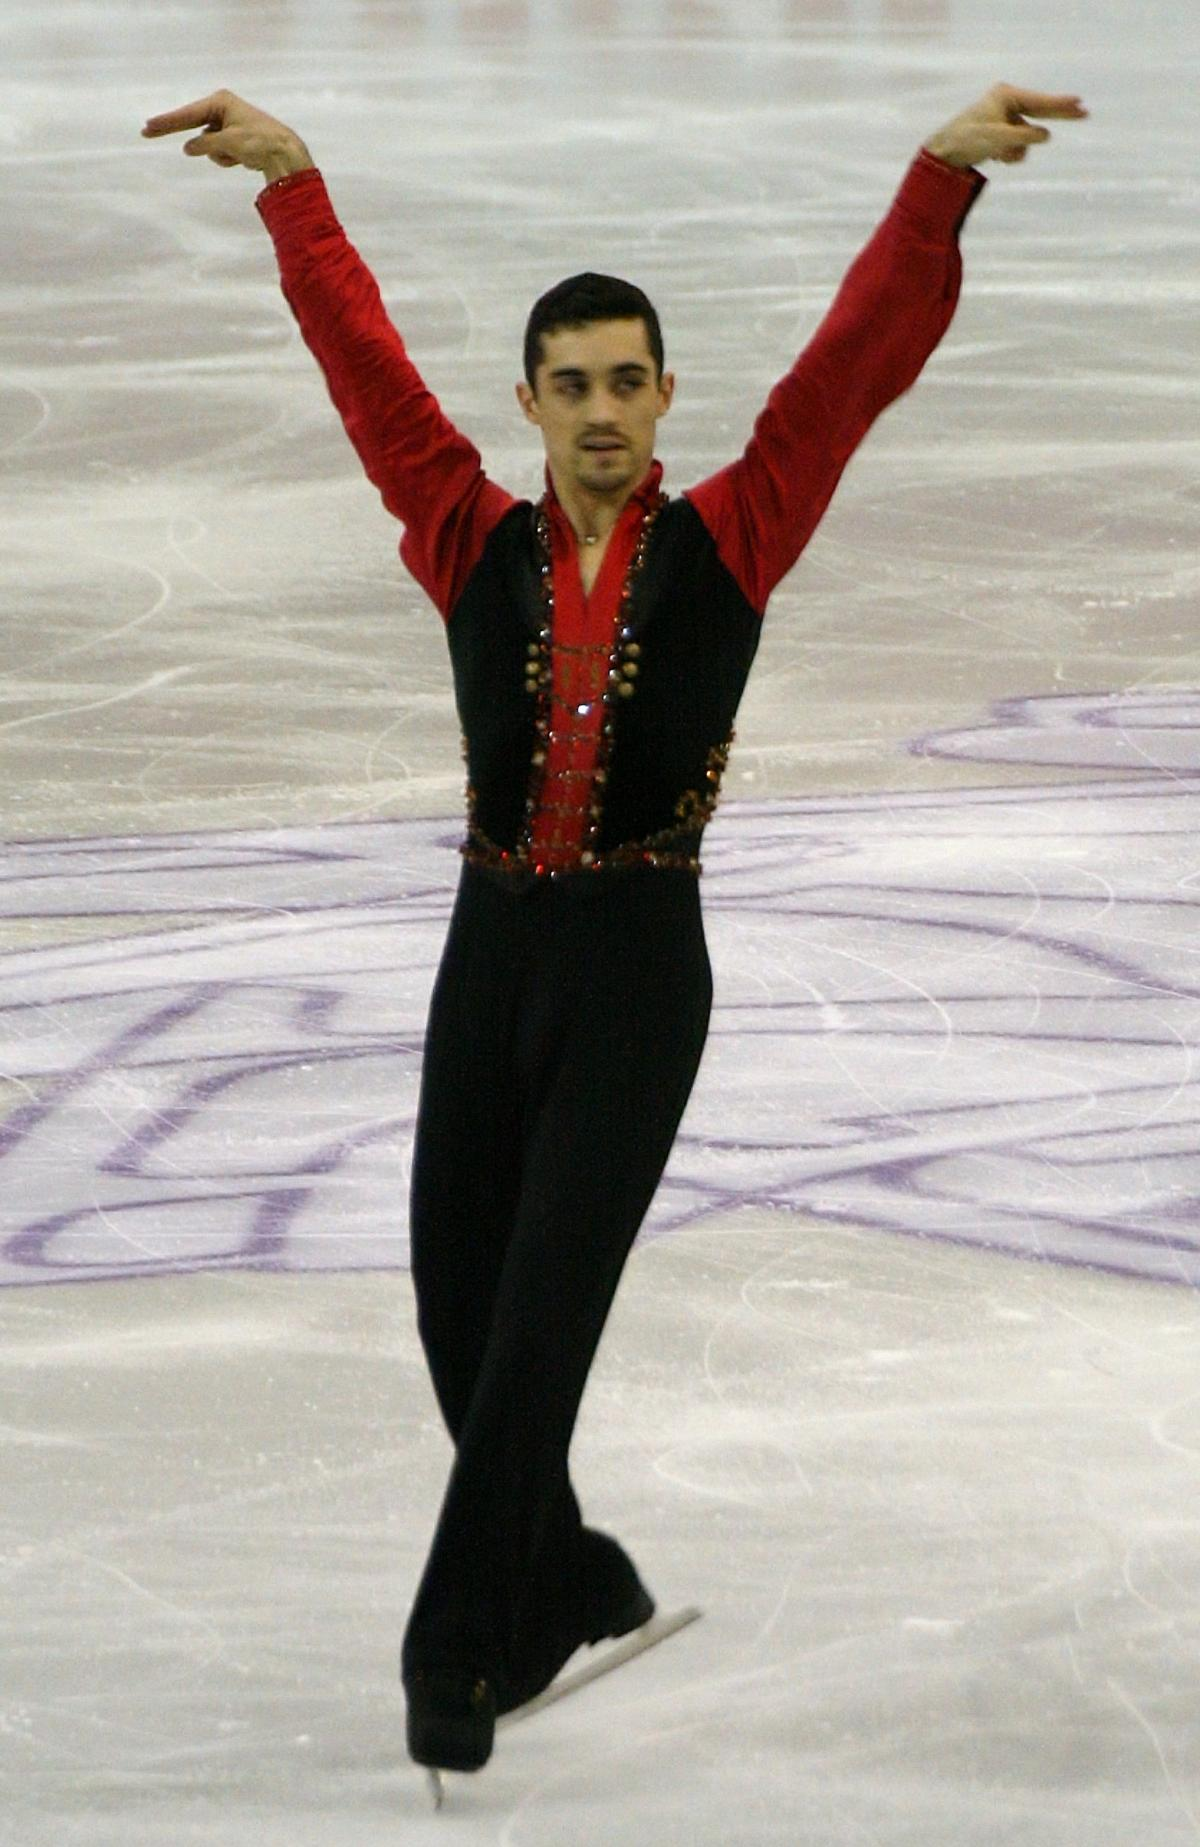 Хавьер Фернандес - бронзовый призер Олимпиады в Пхенчхане-2018 / фото Wikimedia Commons